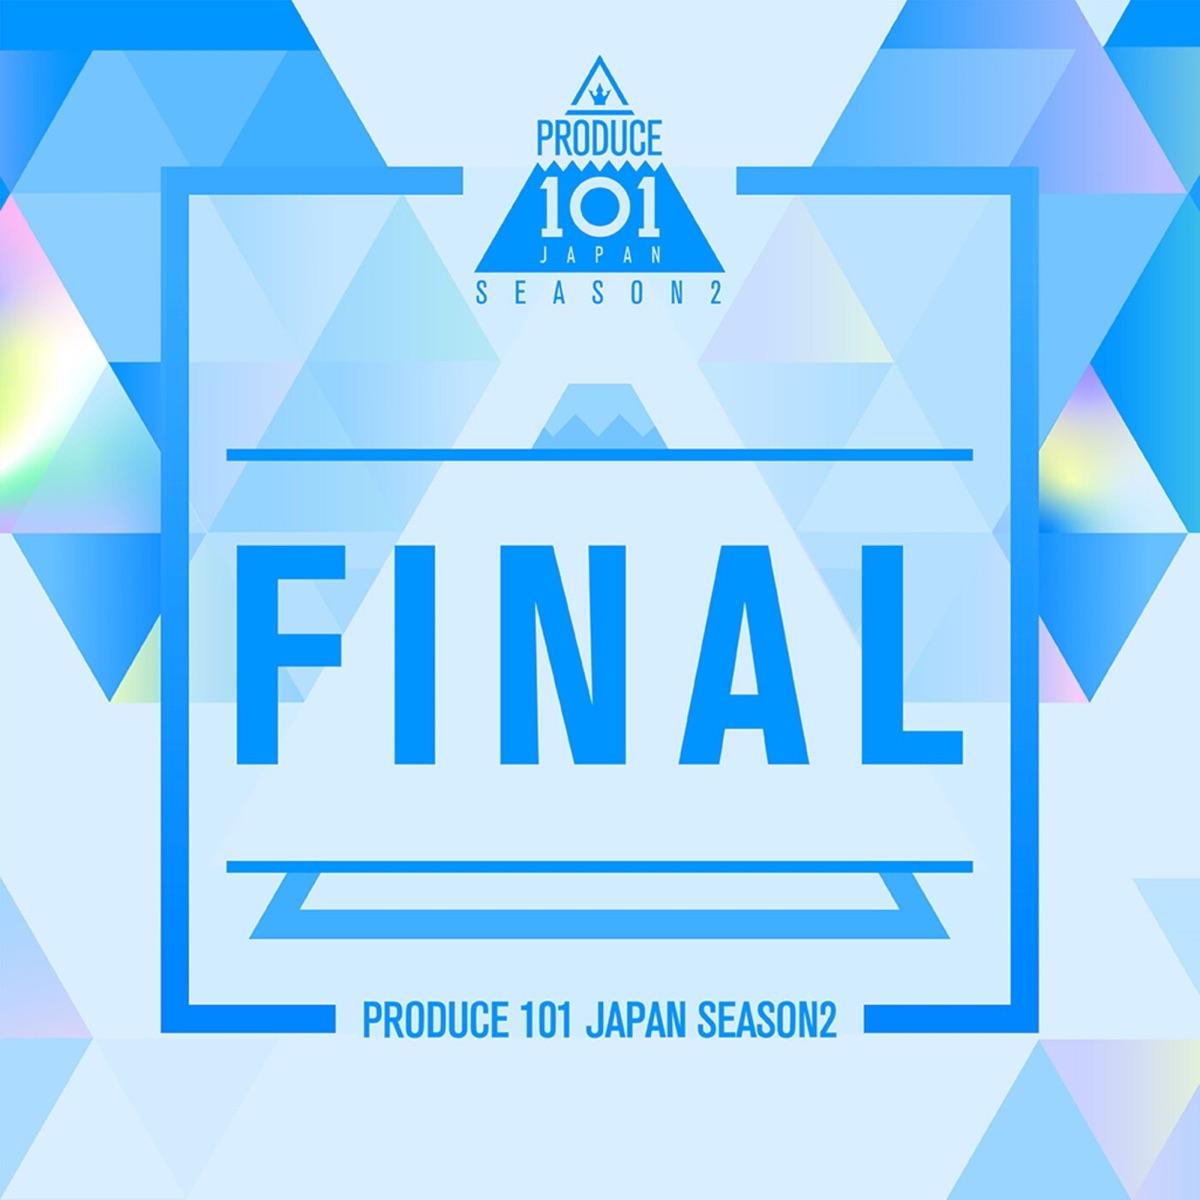 『PRODUCE 101 JAPAN SEASON2 - One Day』収録の『FINAL』ジャケット